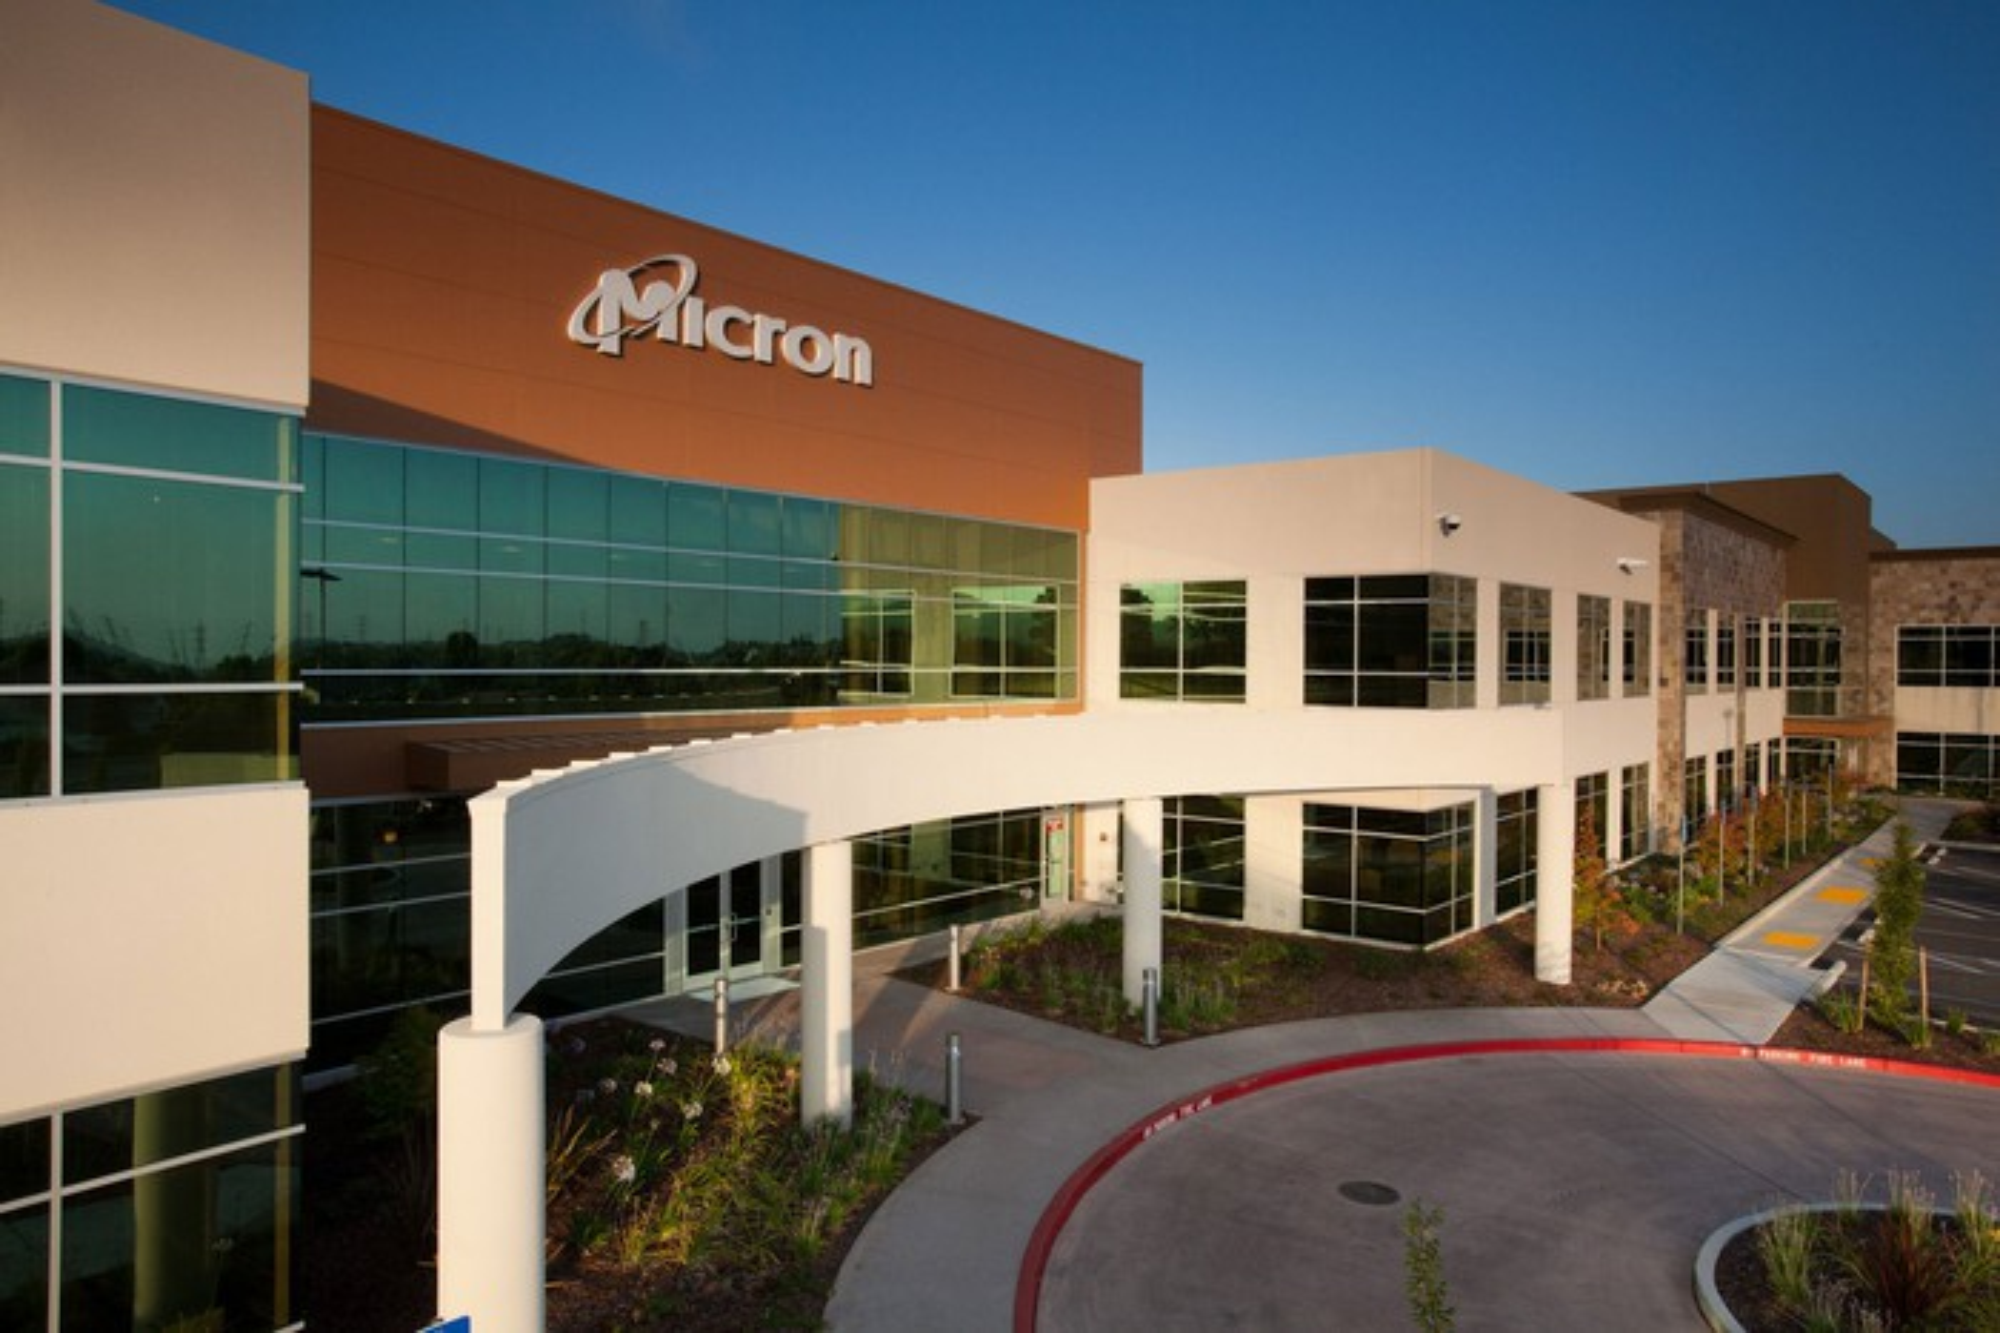 A Micron facility in Folsom, CA.